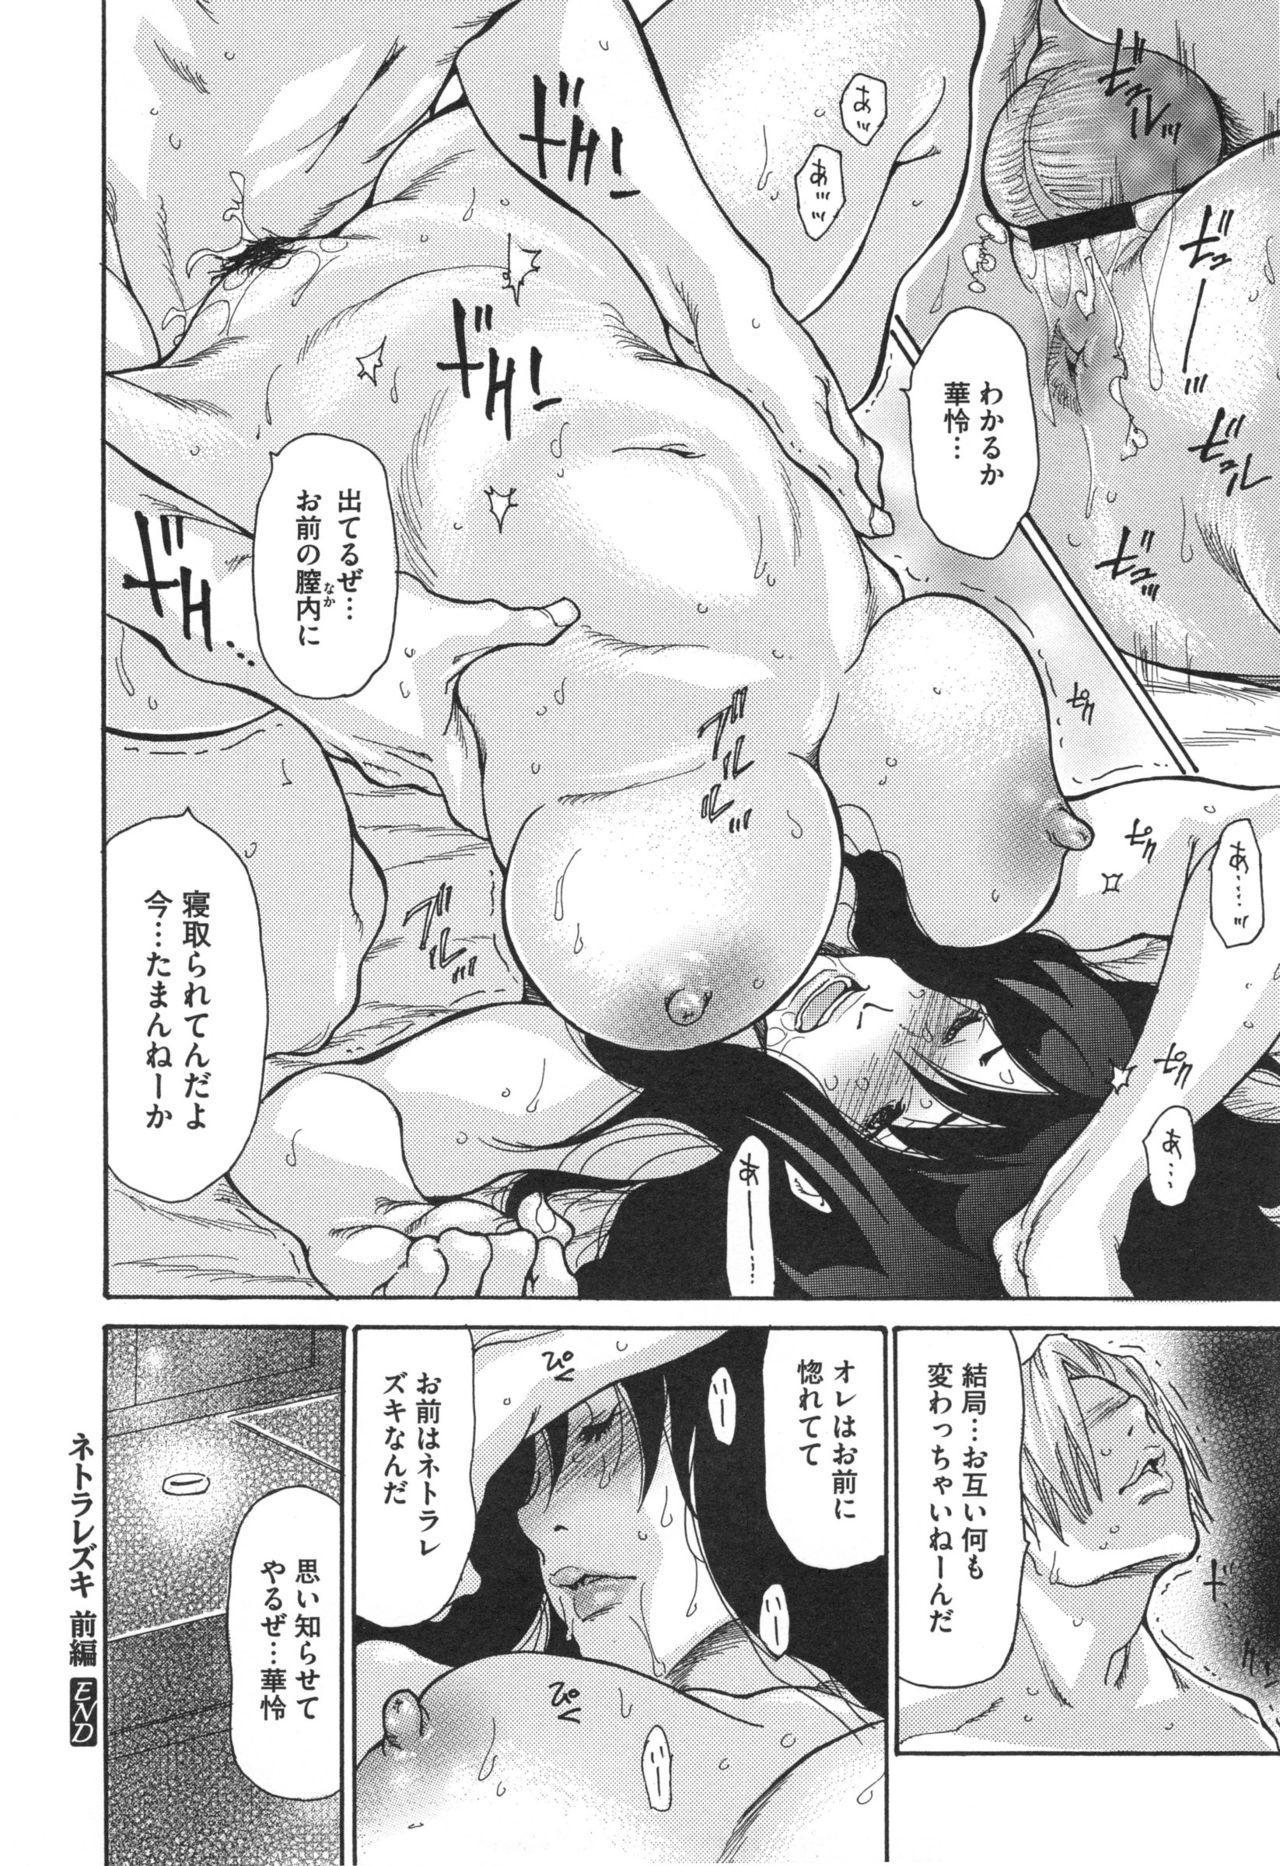 Niku-zuma Netorare Maniacs 28